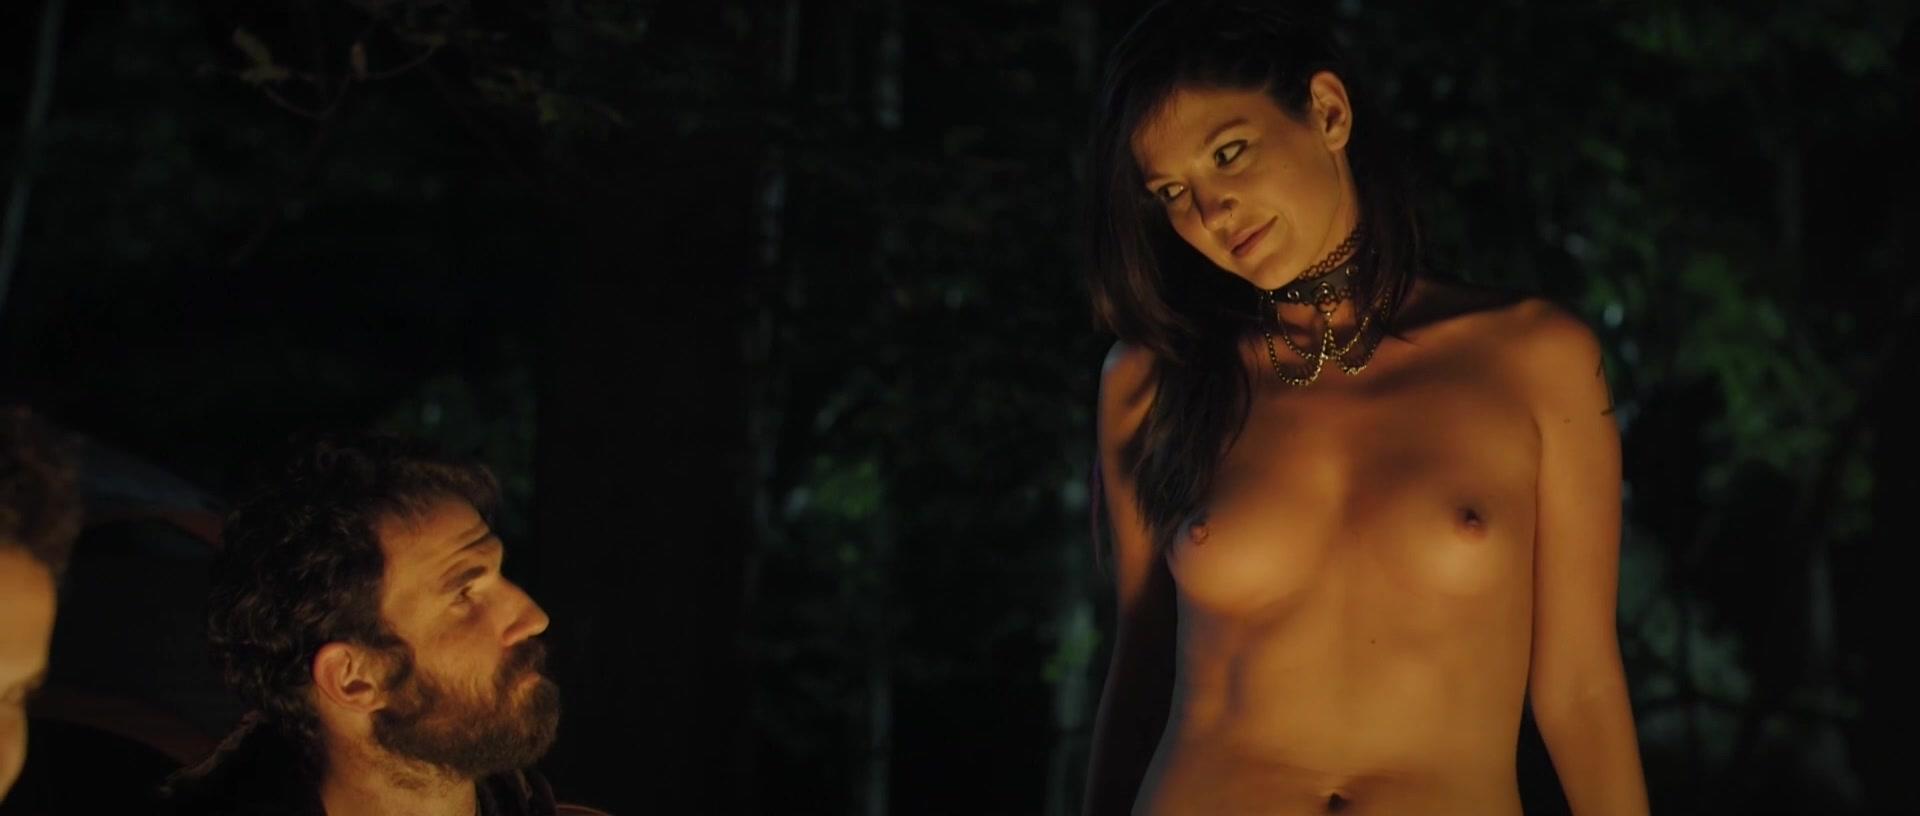 Ana Belen Nude eva hamilton nude - ruin me (2017) video » best sexy scene